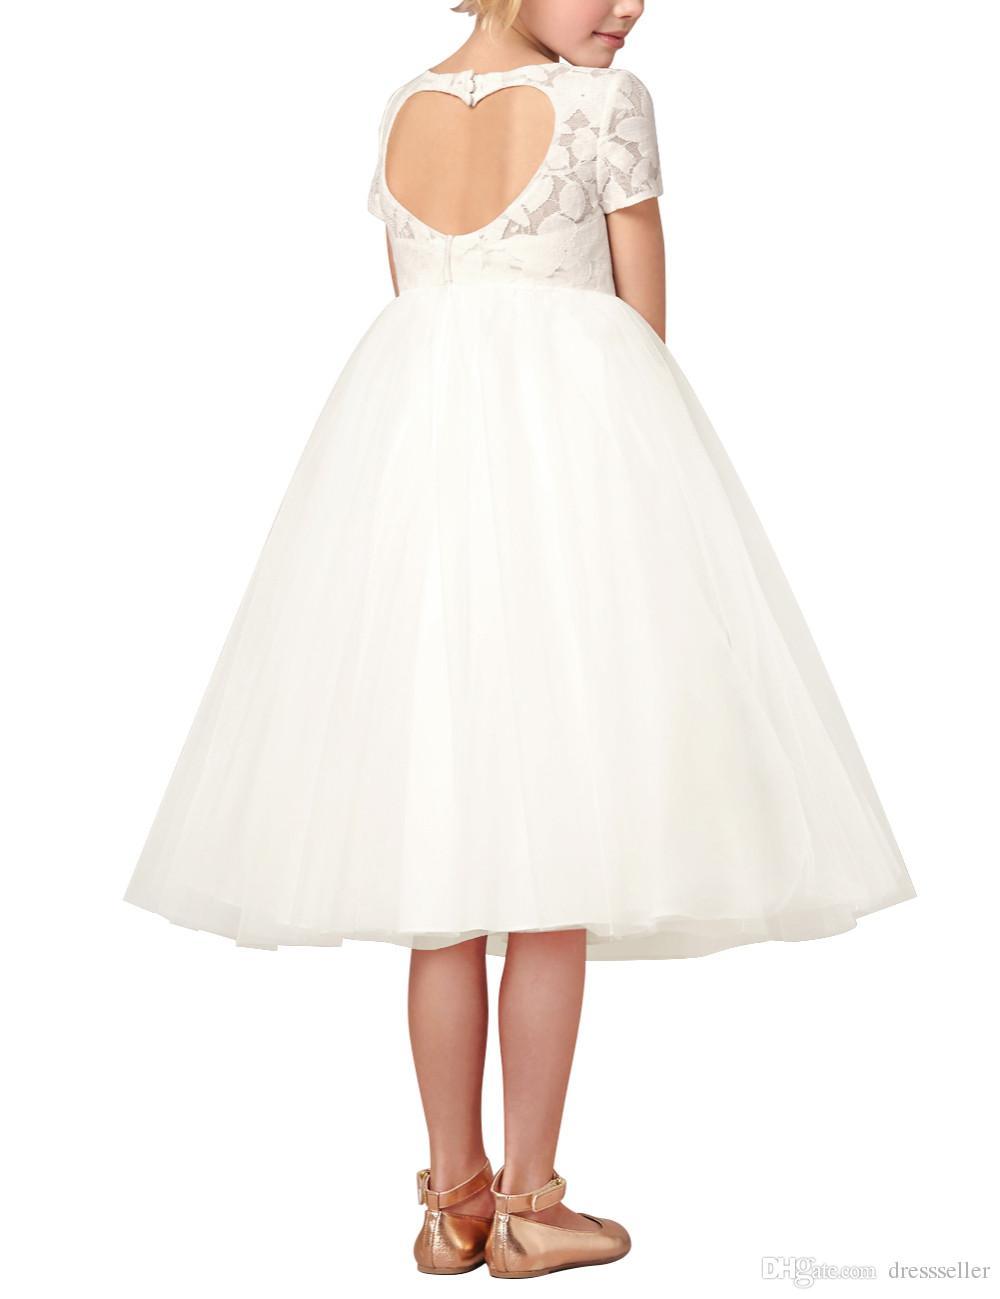 Baby New Flower Girl Dresses White Ivory Real Party Pageant Communion Dress Little Girls Kids Children Dress for Wedding